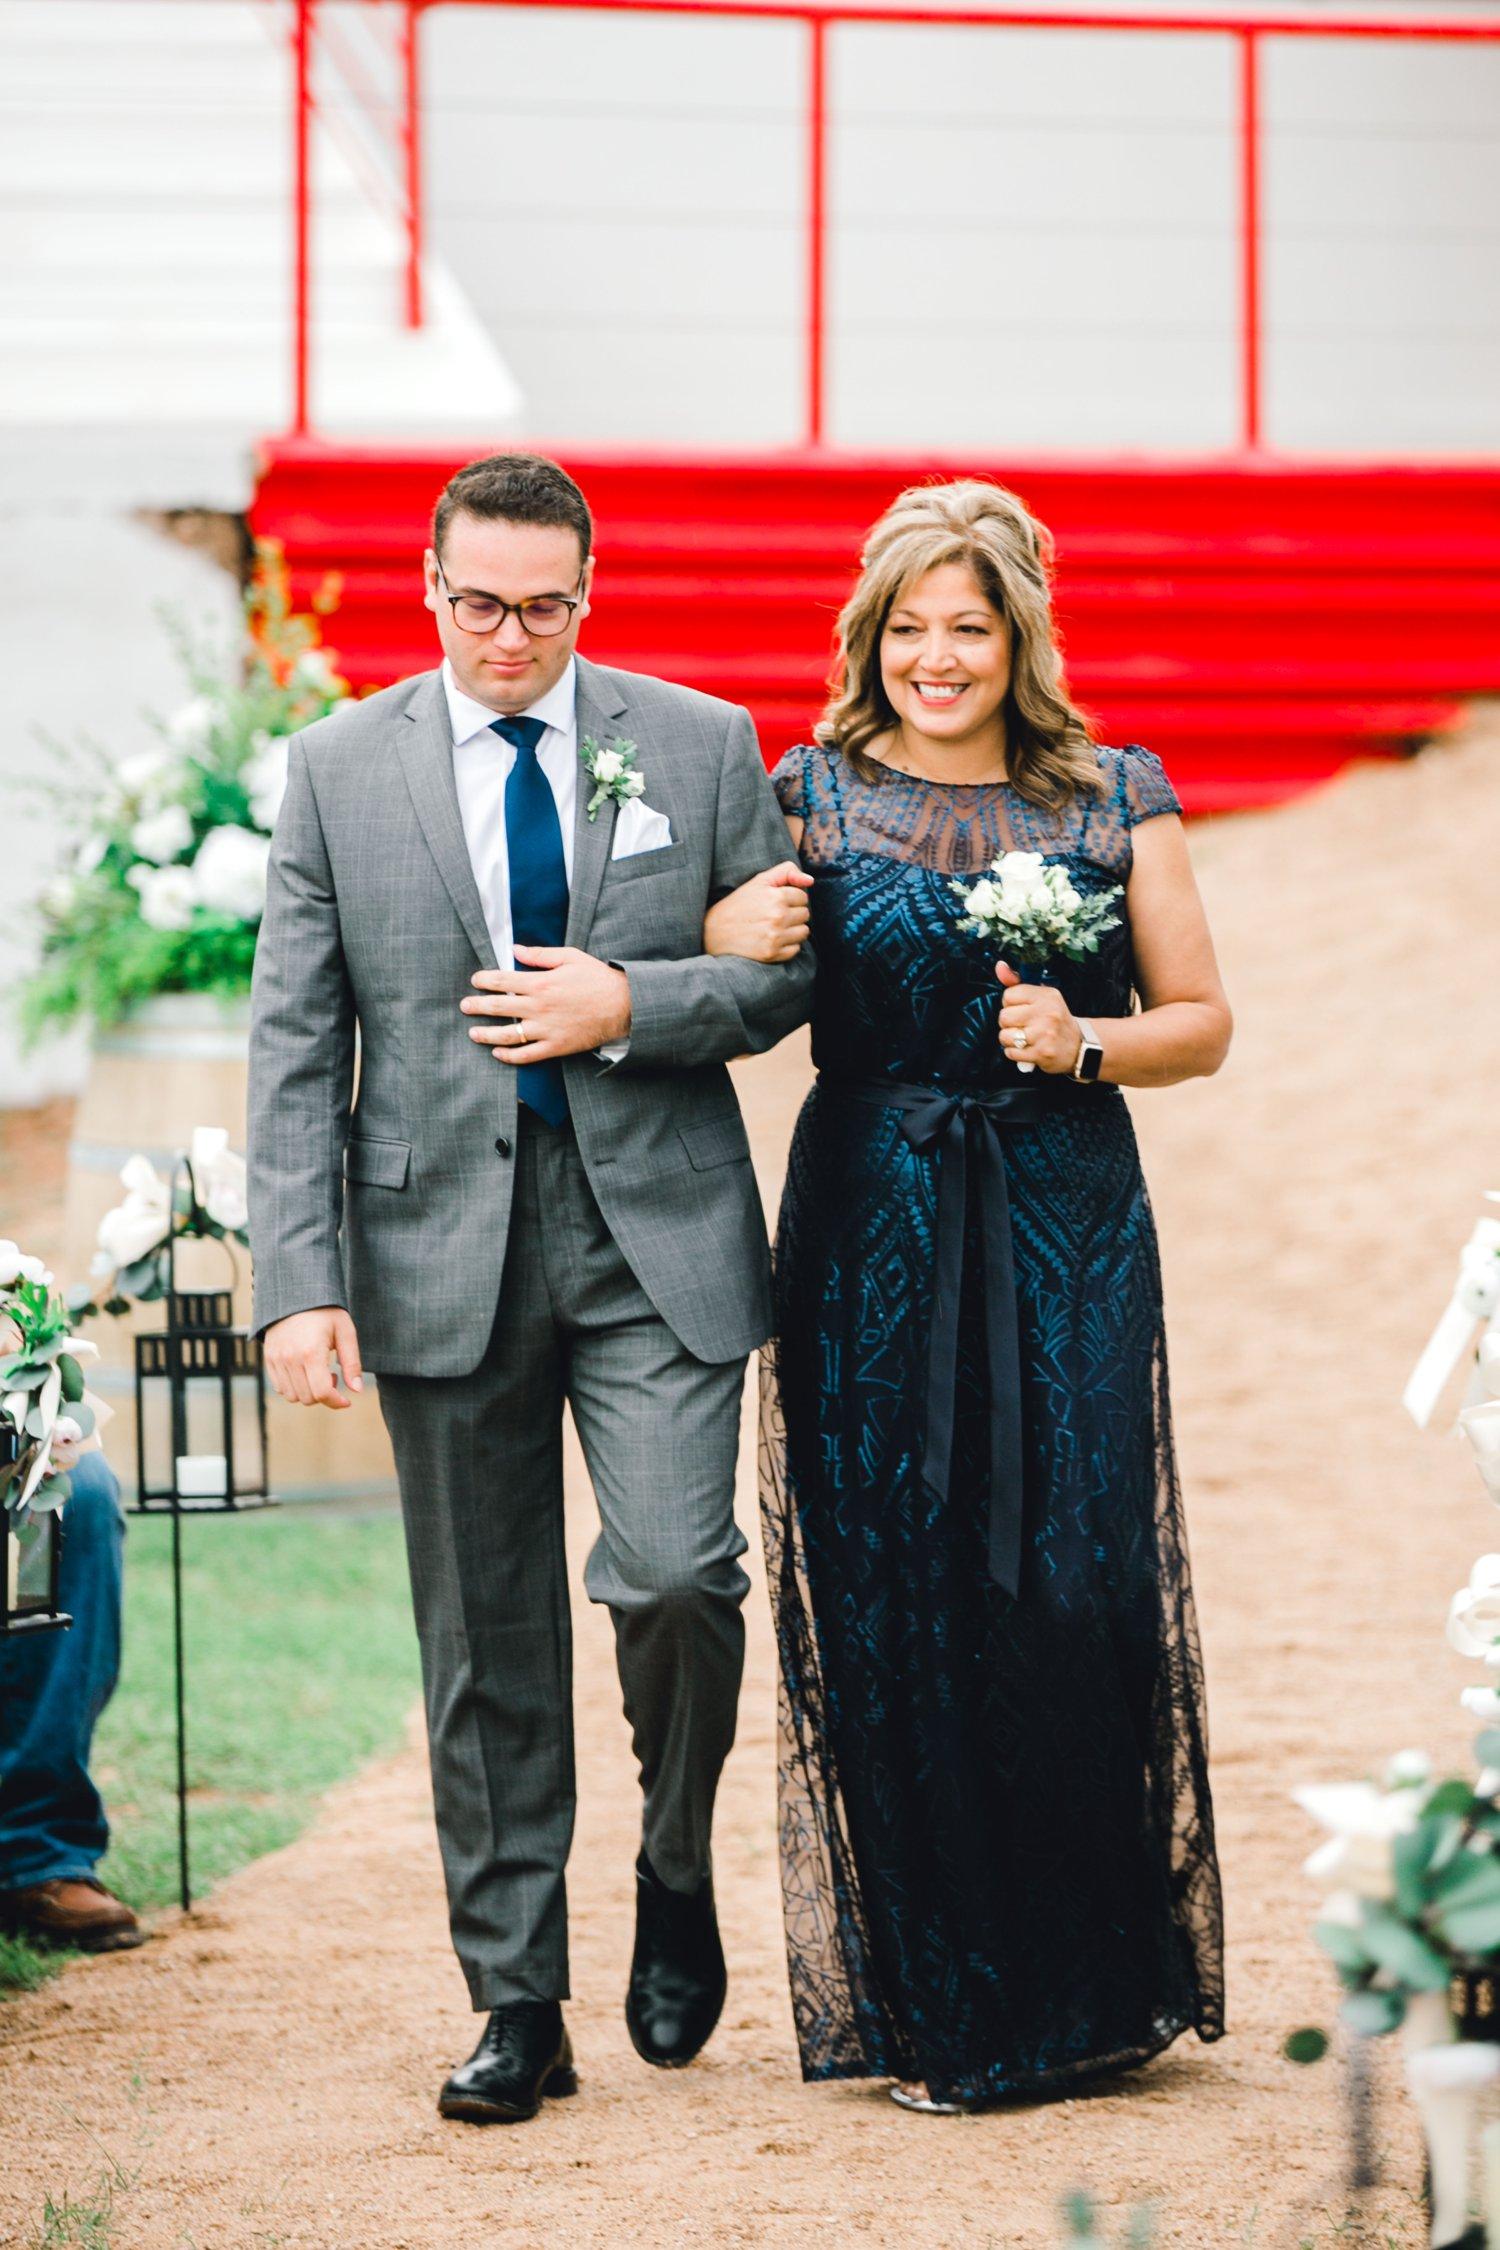 Ashley_John_English_Elegant_Texas_Wedding_Outdoors_Ranch_Caprock_Winery_ALLEEJ_0100.jpg